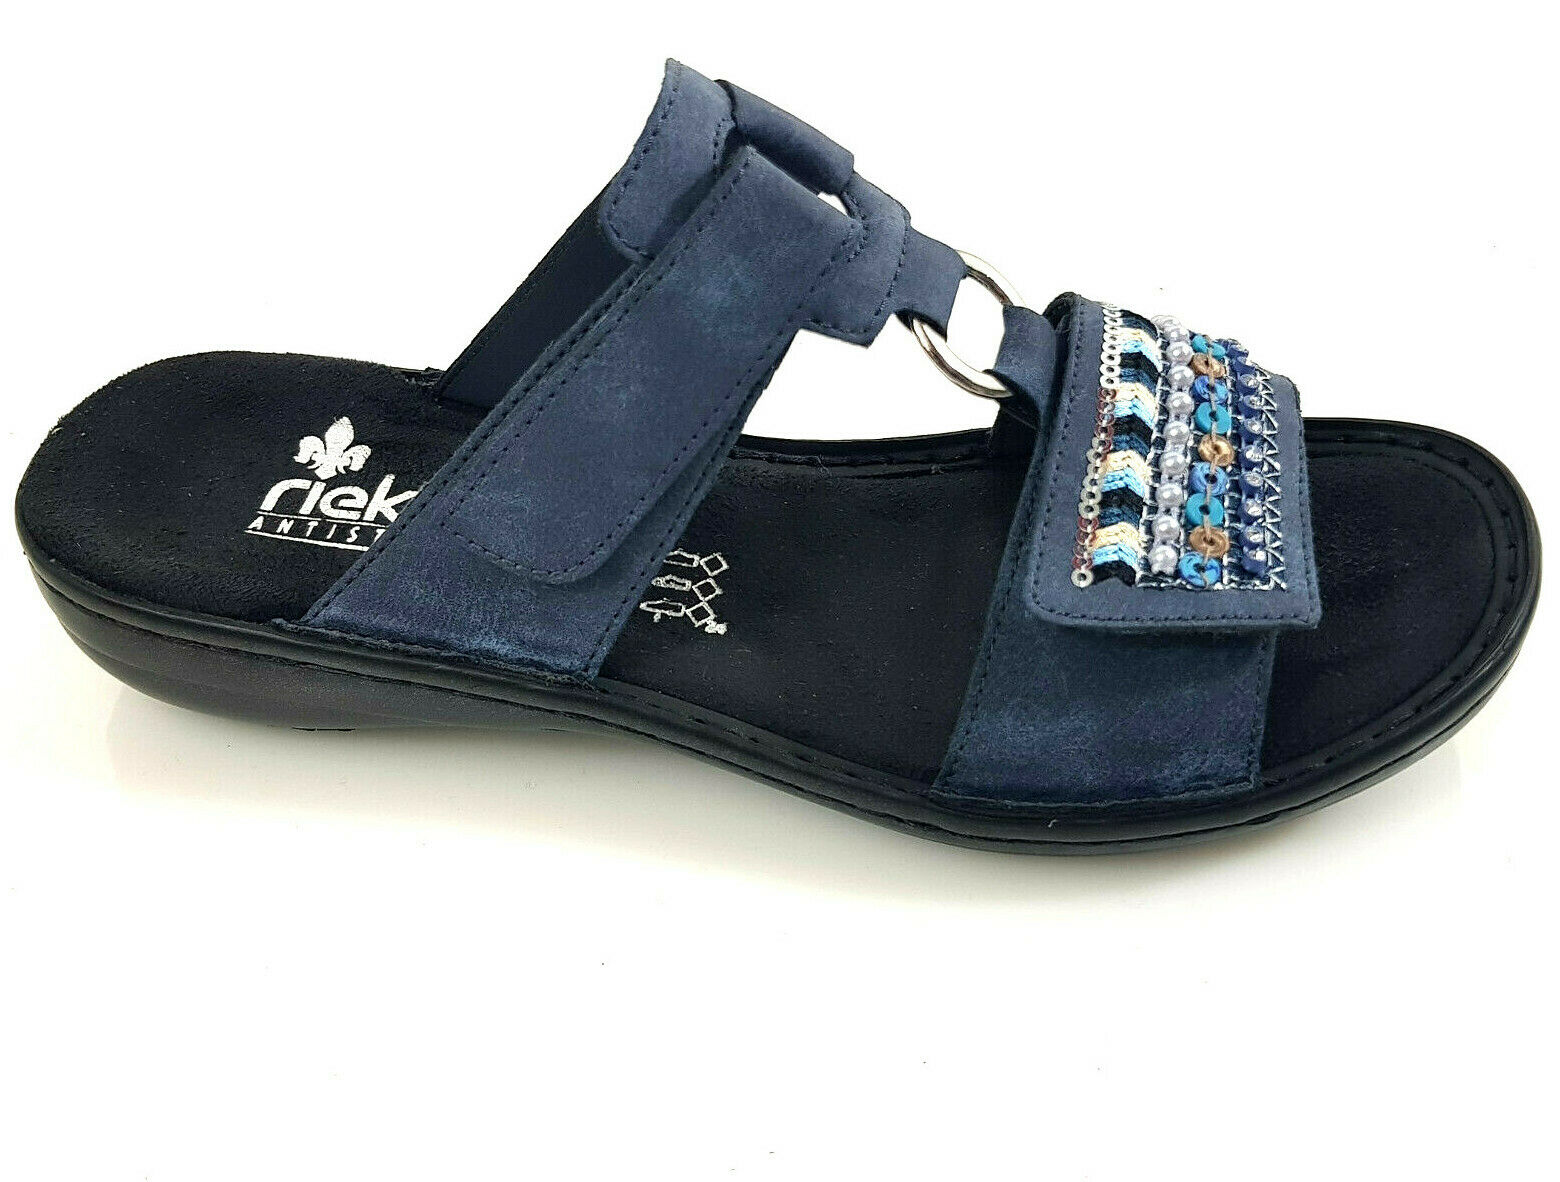 Rieker señora sandalia es casa sandalias zapatos de nuevo 608p6 talla 37-42